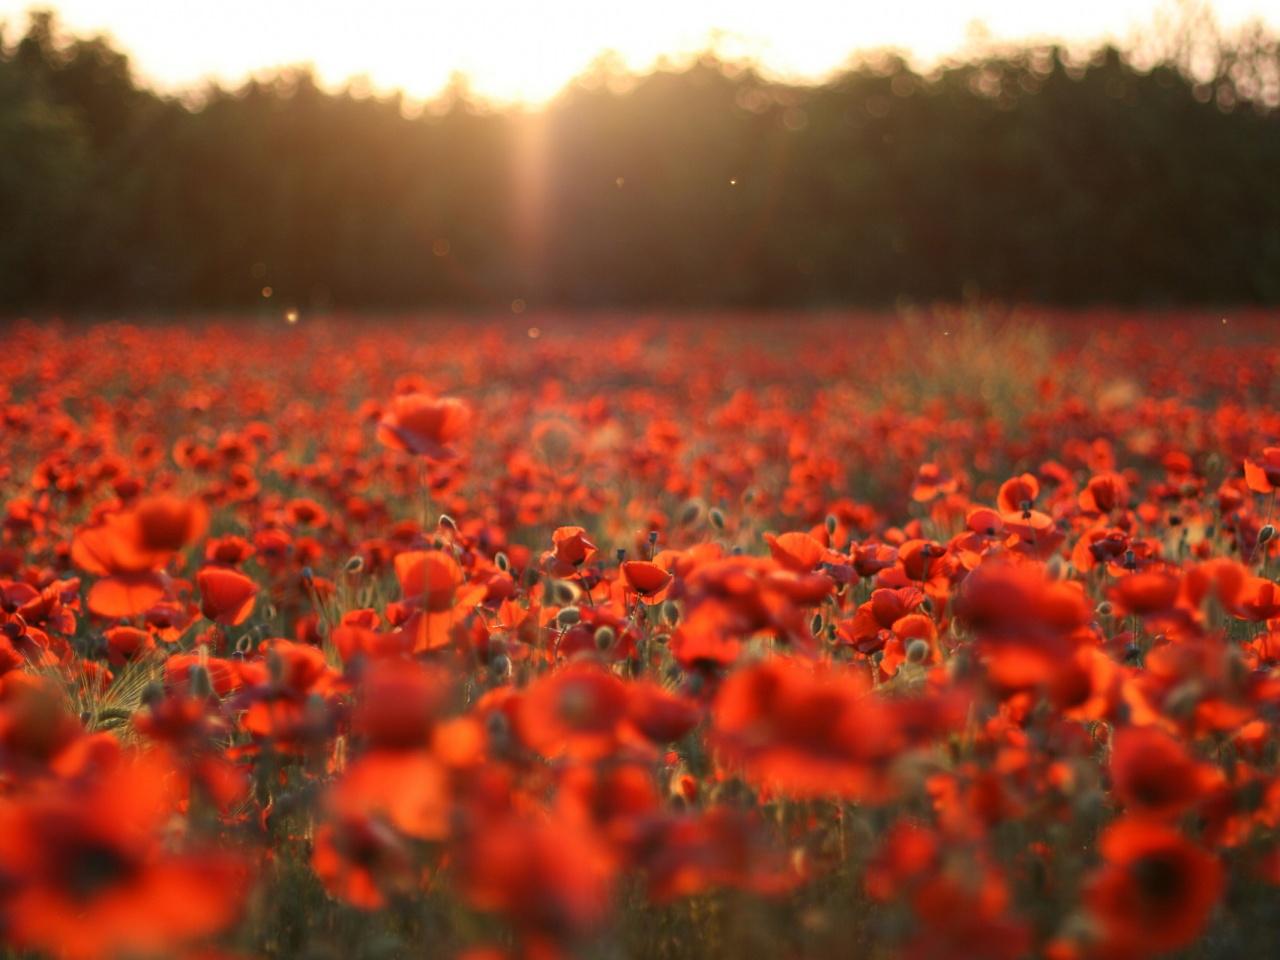 Poppy Field Sunset Wallpaper 1280x960 Poppy Field Sunset Wallpaper